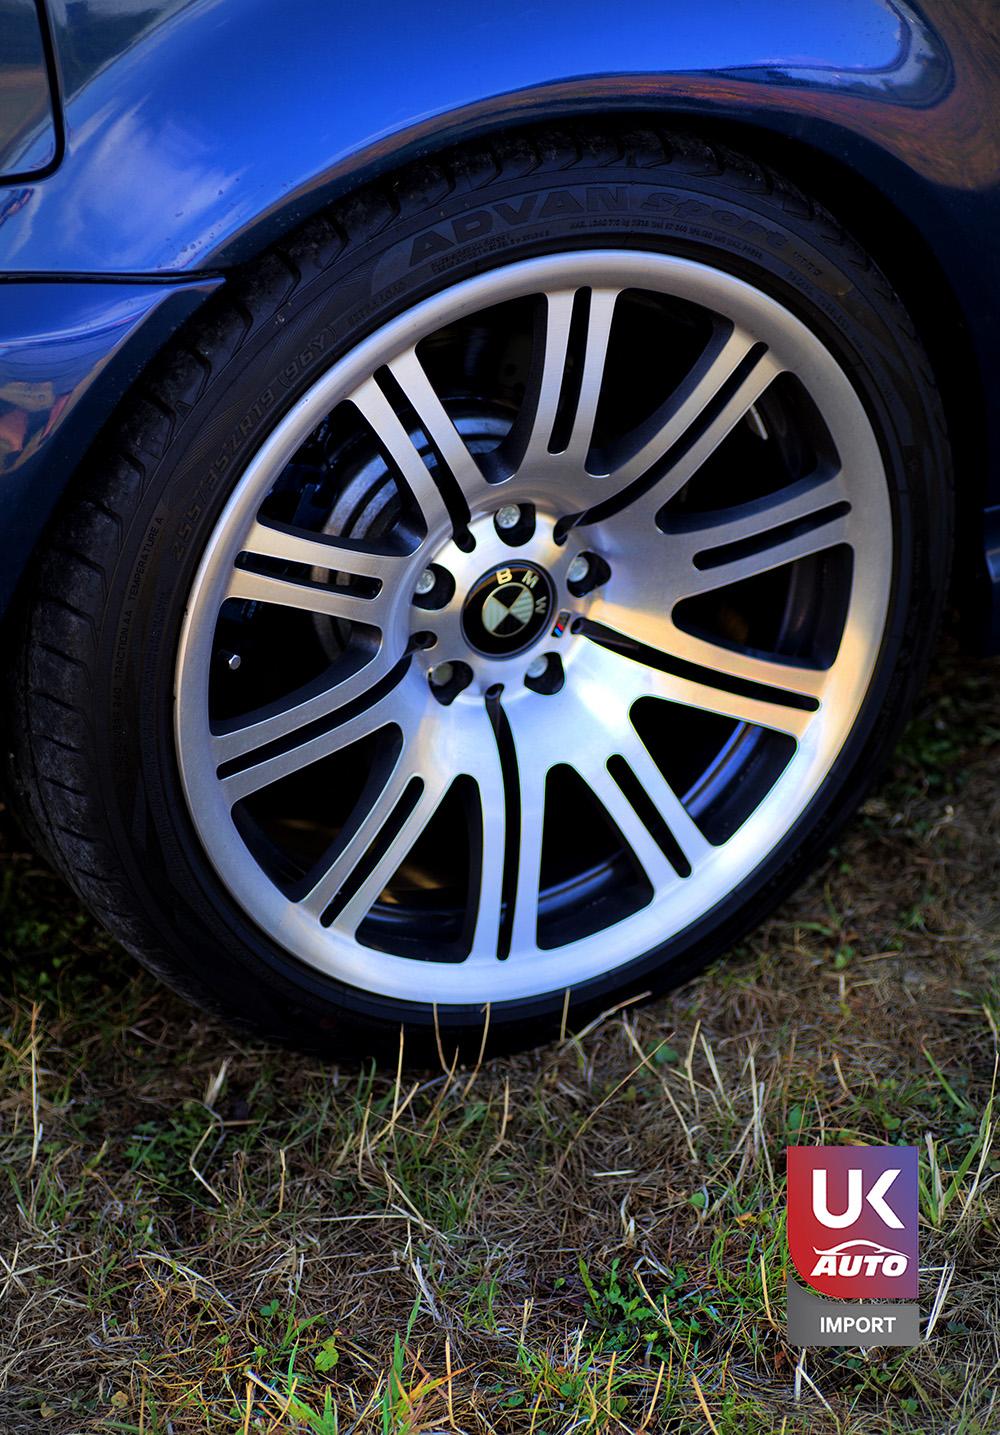 IMG 2441 - RHD PASSION - Importation BMW M3 RHD E46 pour Benjamin par ukauto.fr